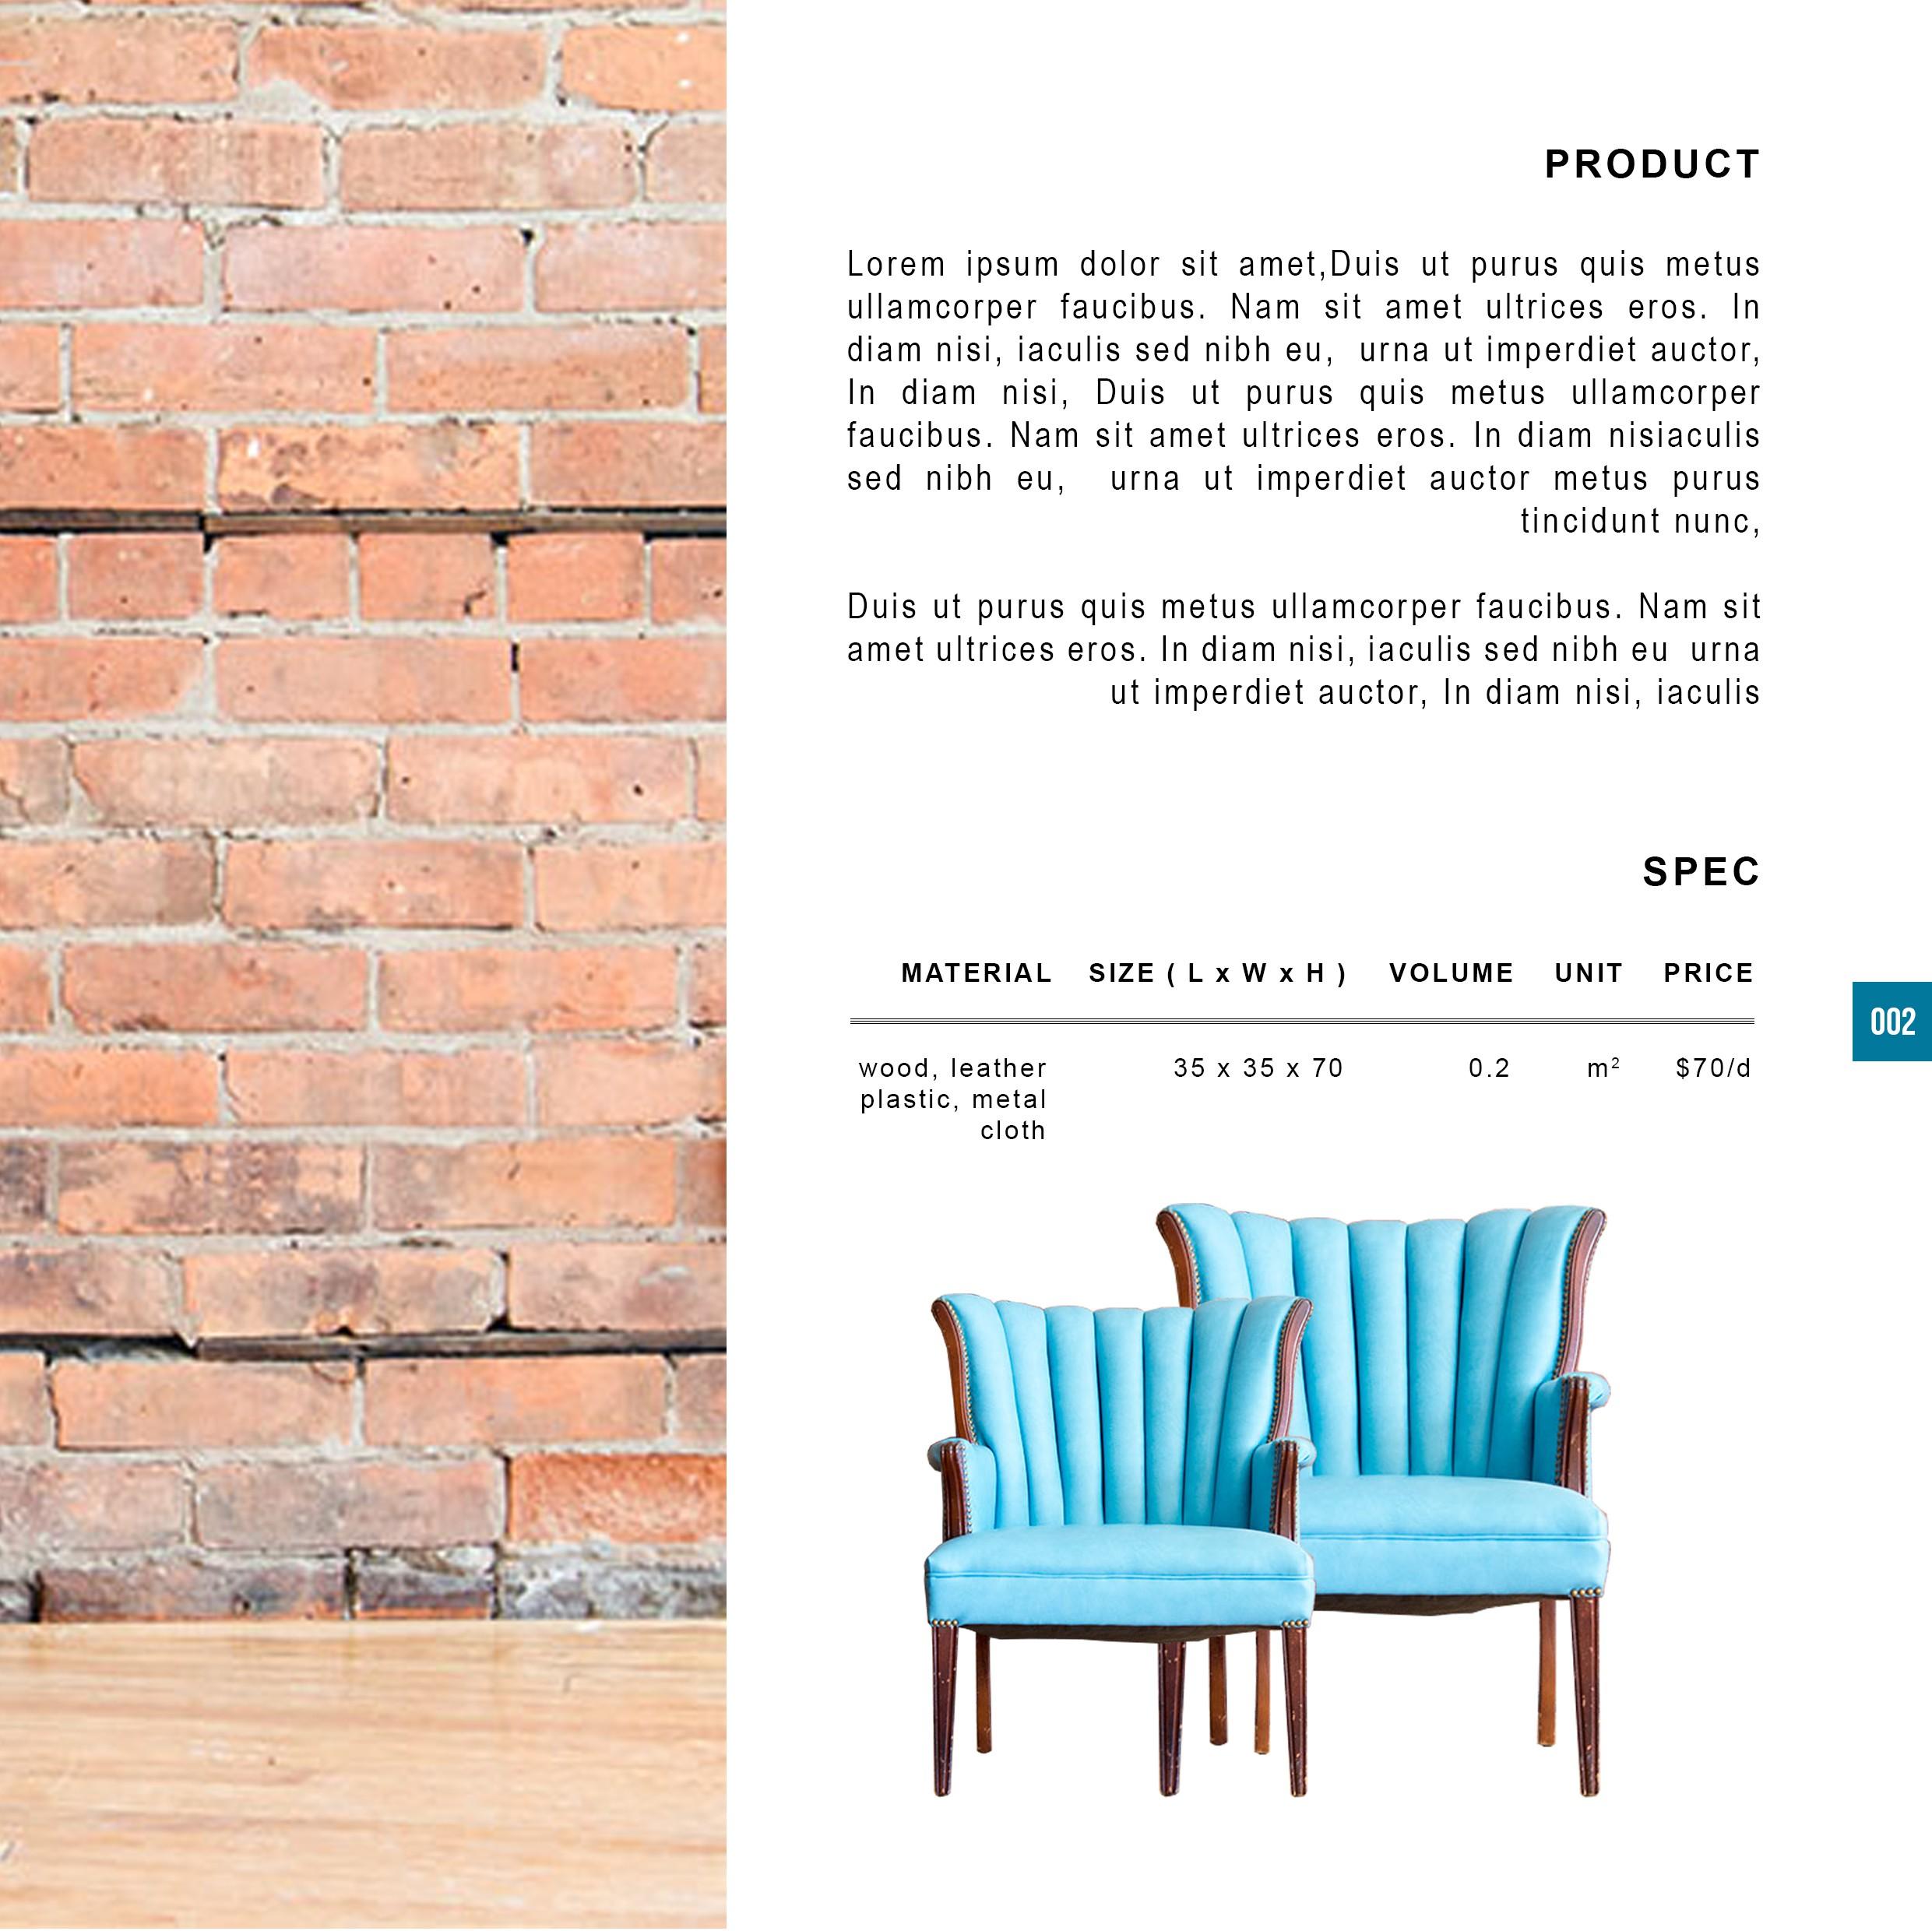 Vintage furniture rentals-catalog of inventory